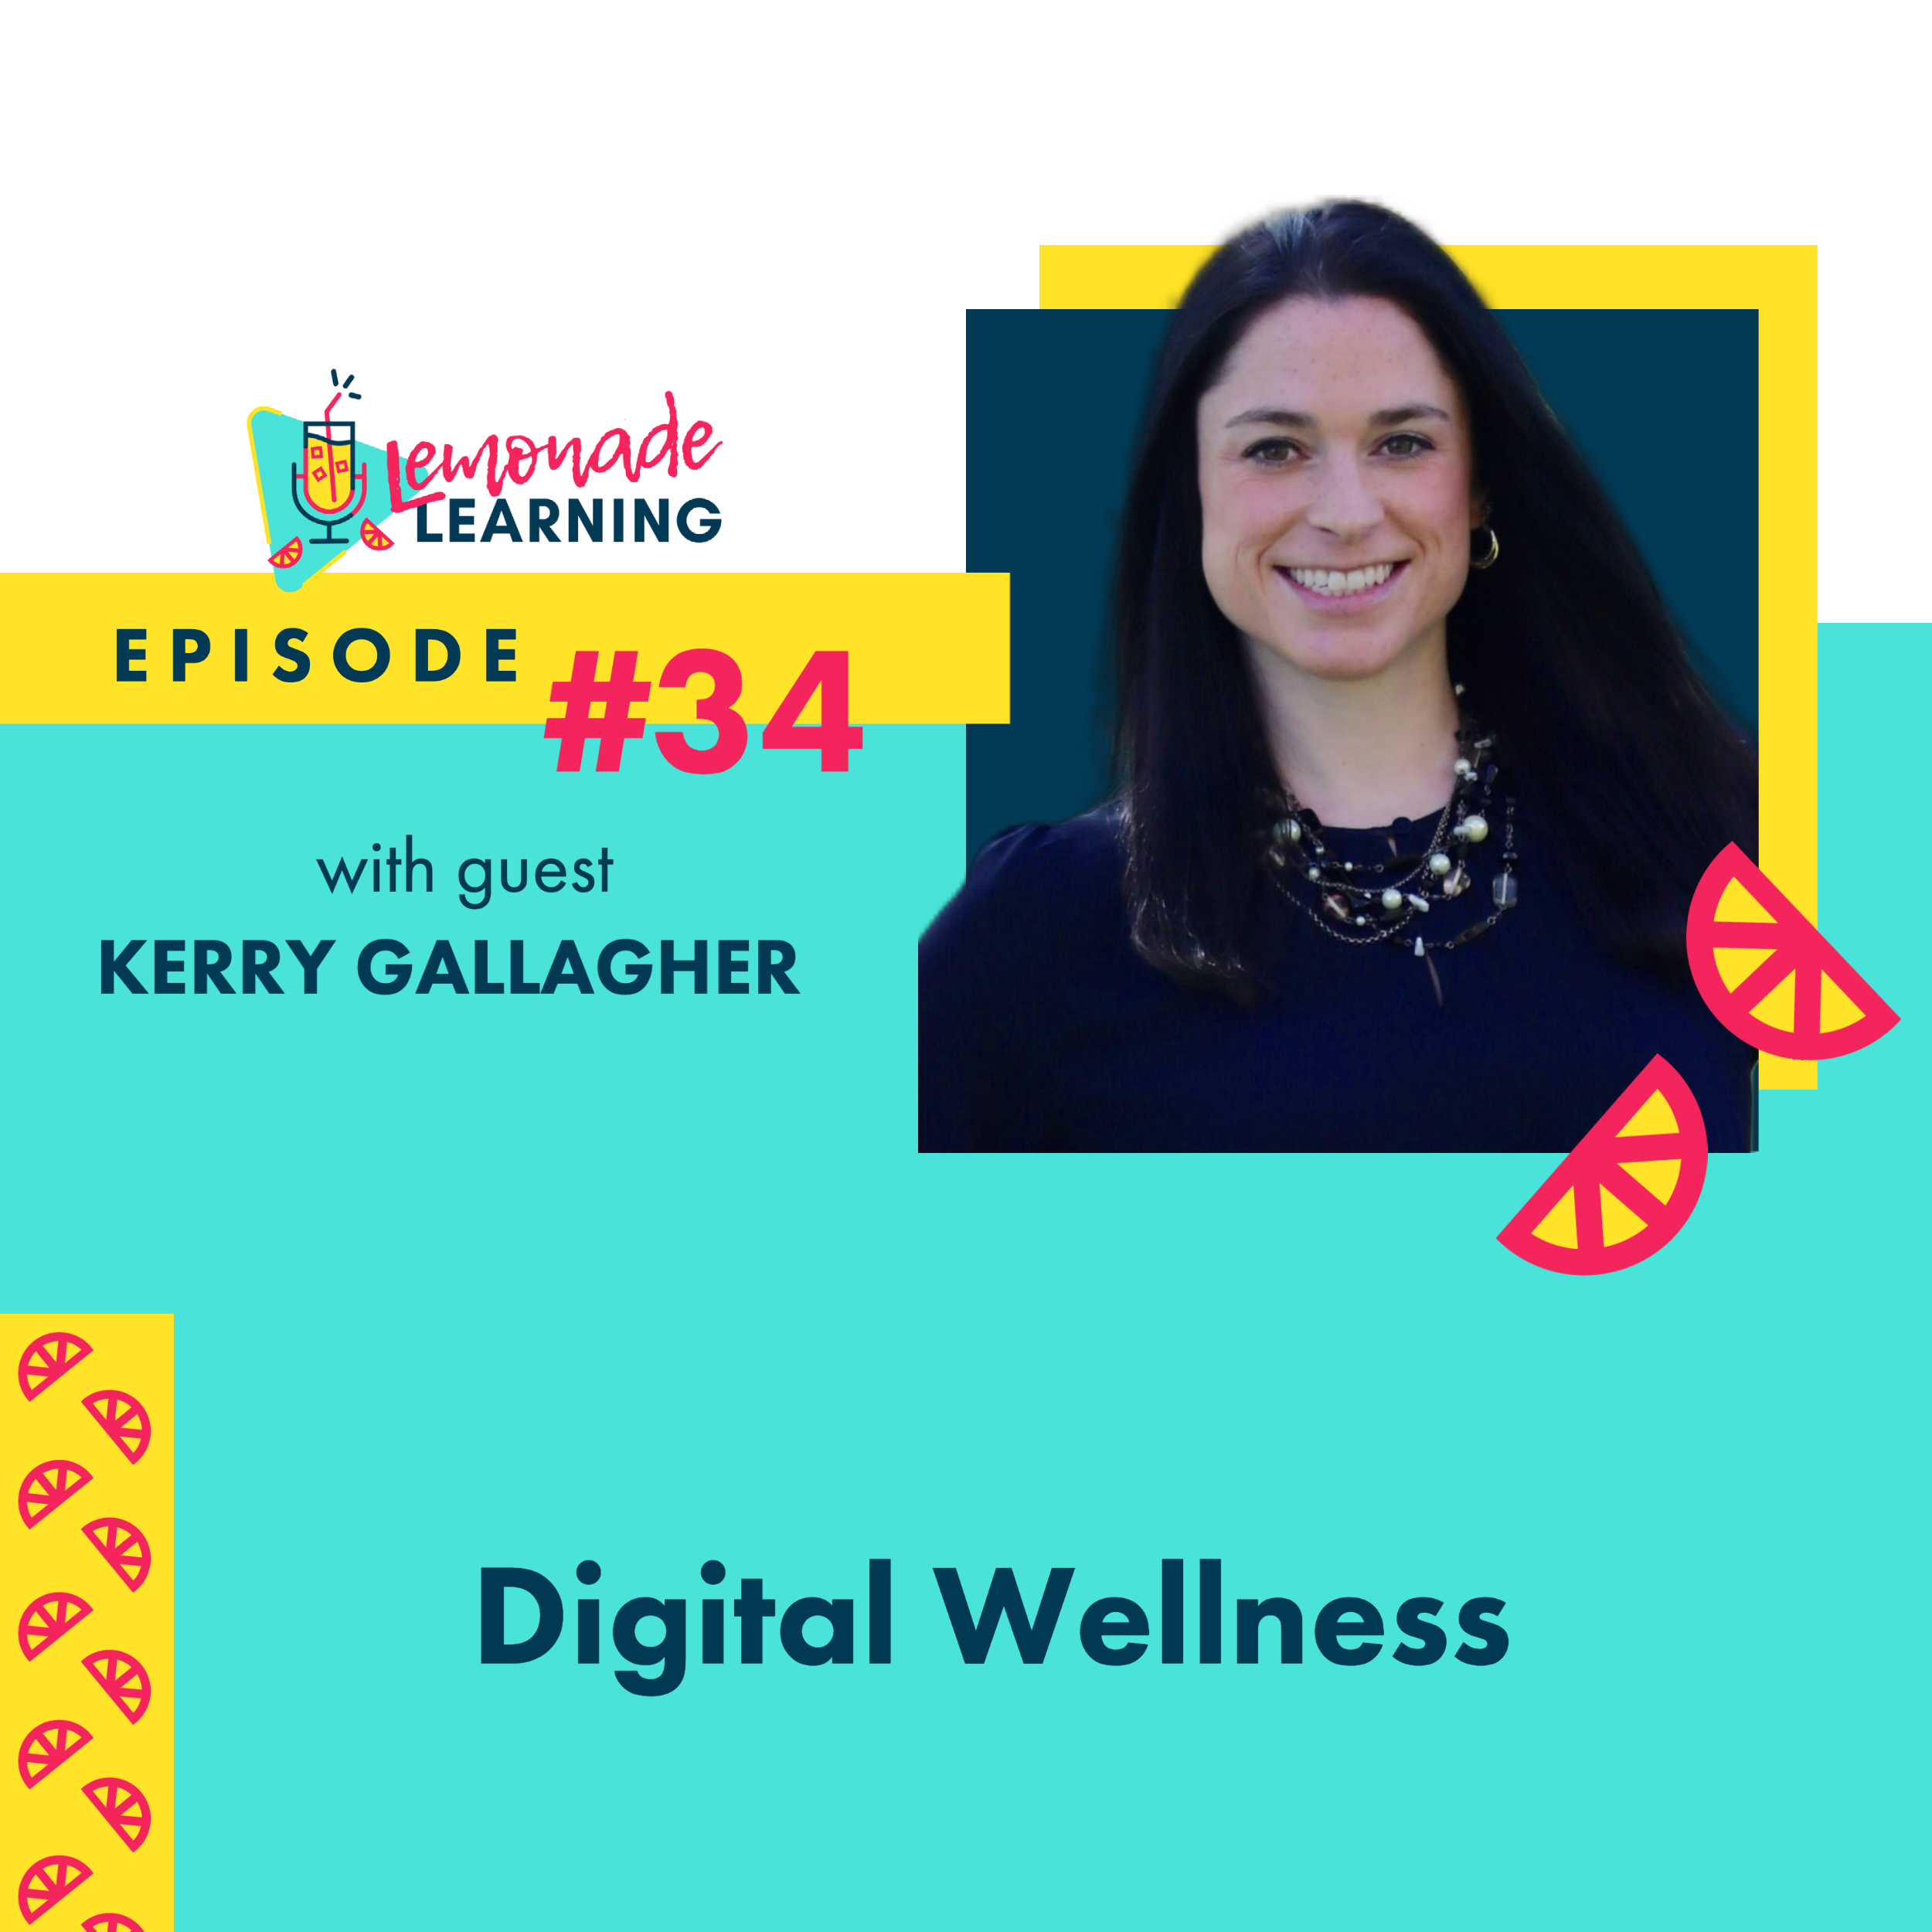 Kerry Gallagher joins Lemonade Learning for Episode 34, Digital Wellness